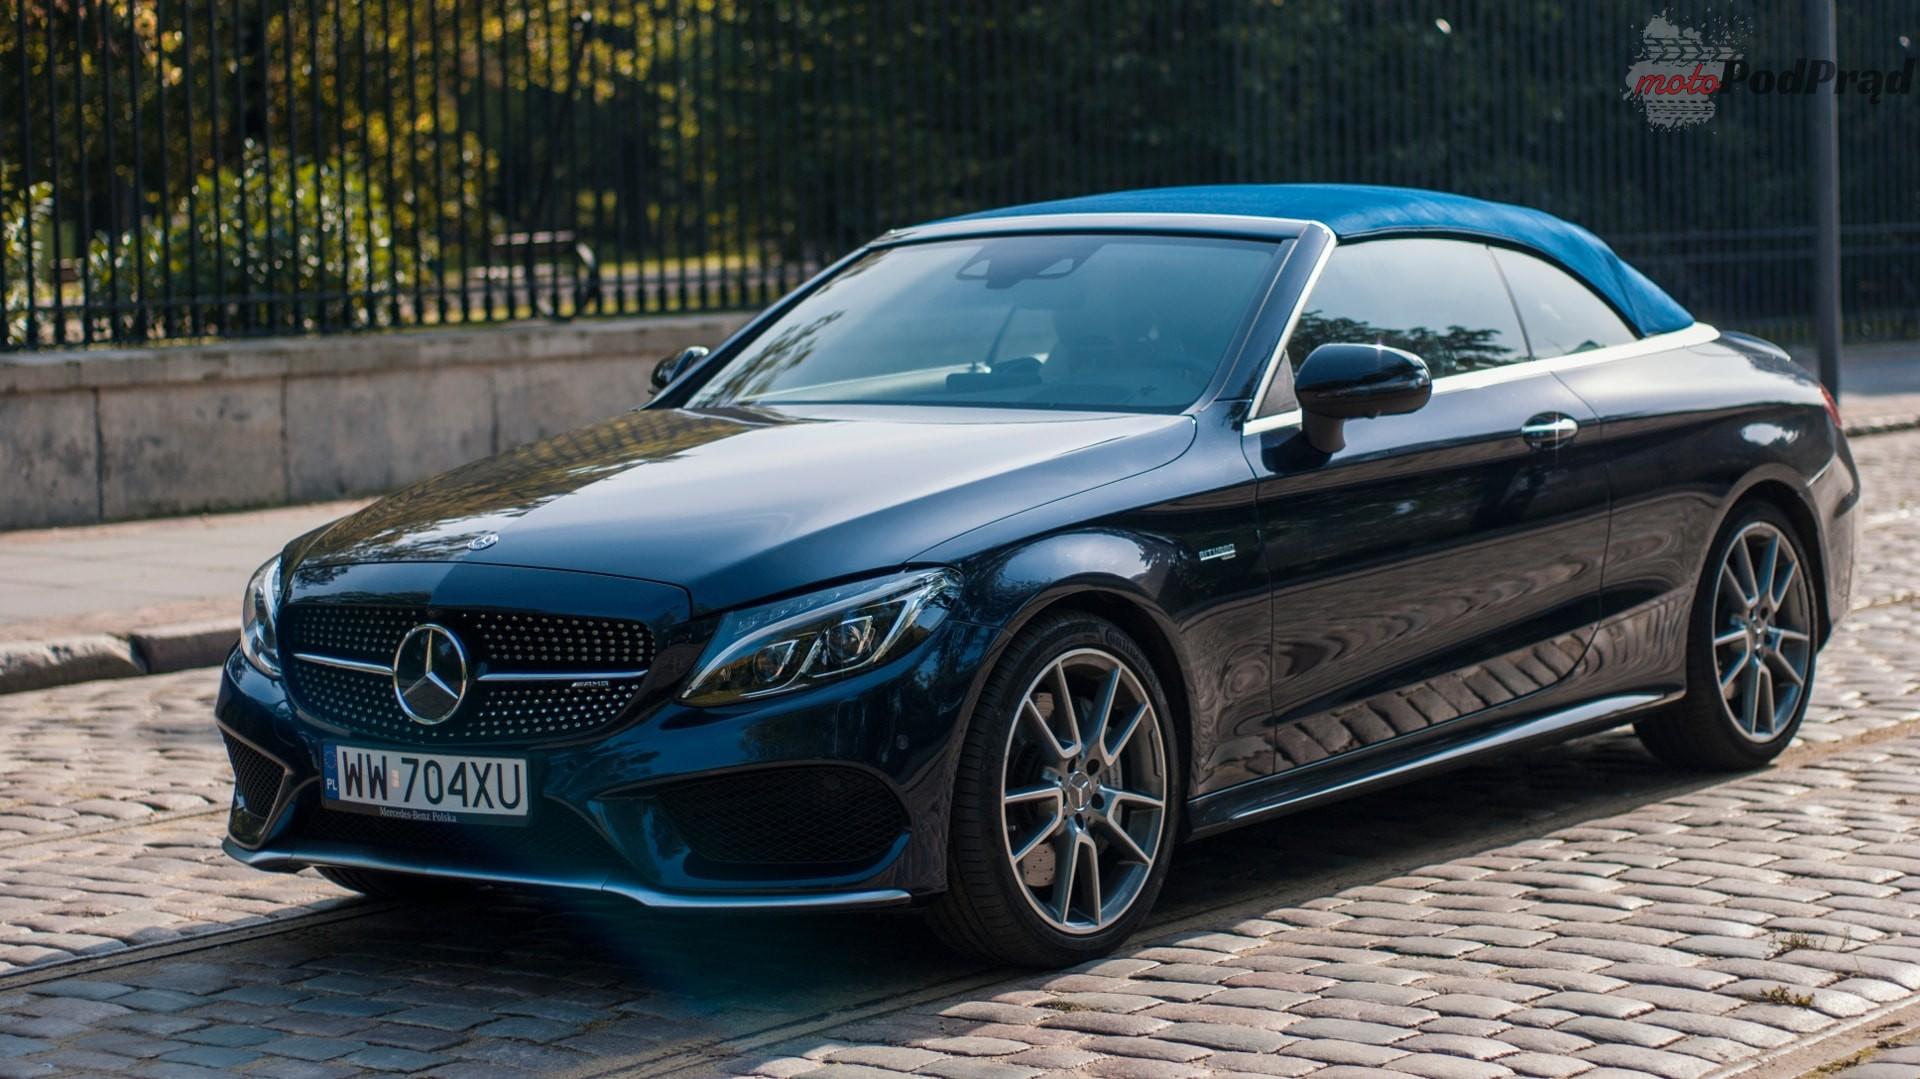 mercedes amg c43 cabrio 4 Minitest: Mercedes AMG C 43 Cabrio   Ostatnie promienie słońca